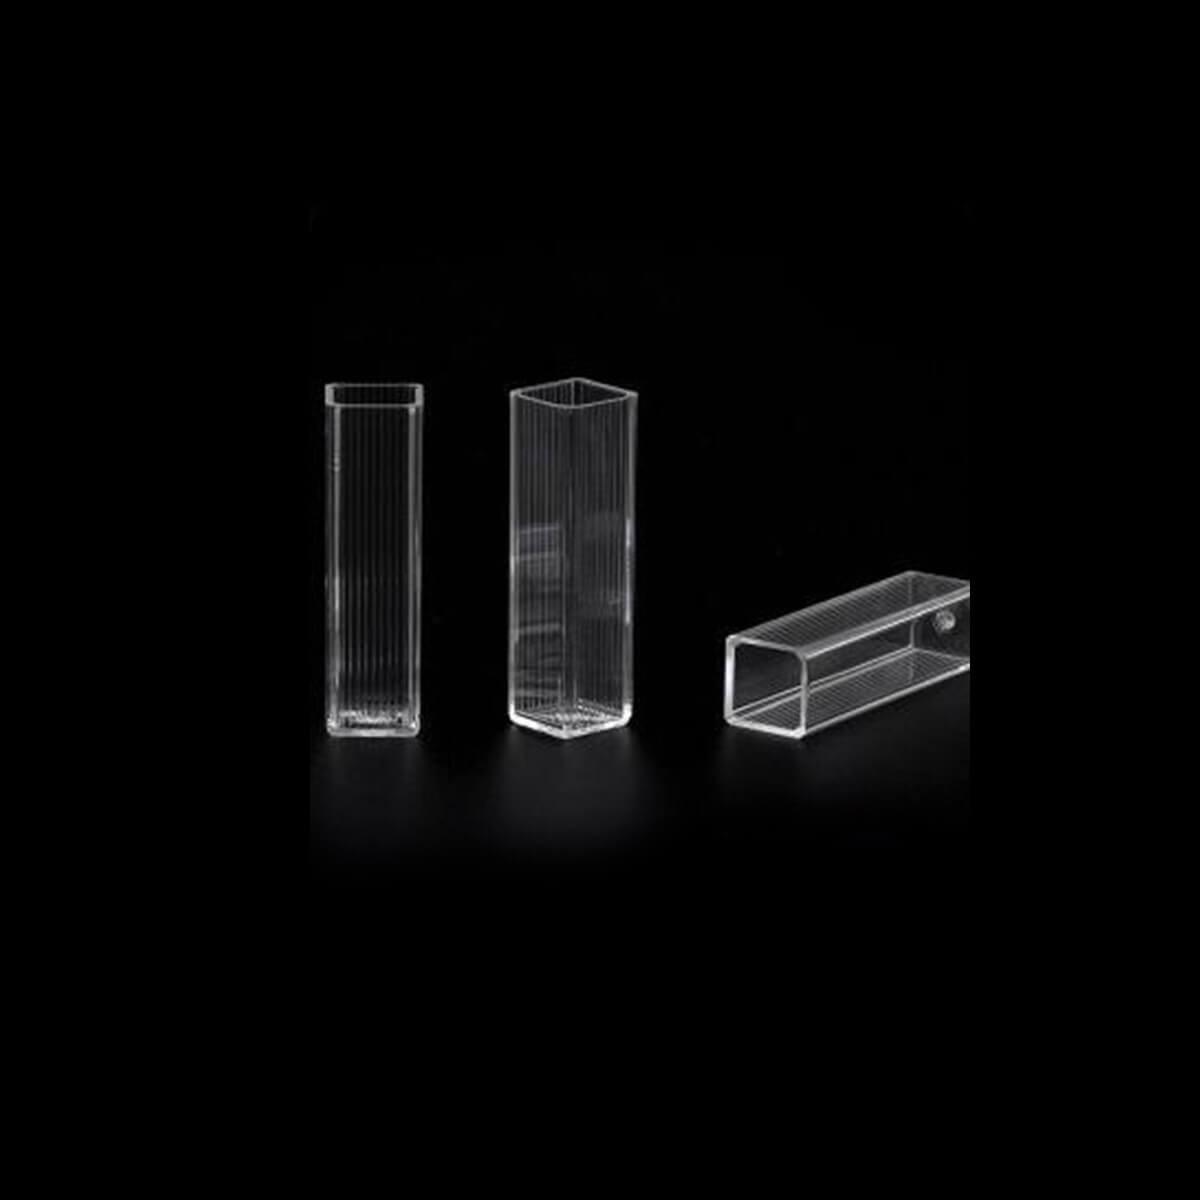 Cubeta para Espectrofotômetro em Poliestireno 100 Unidades